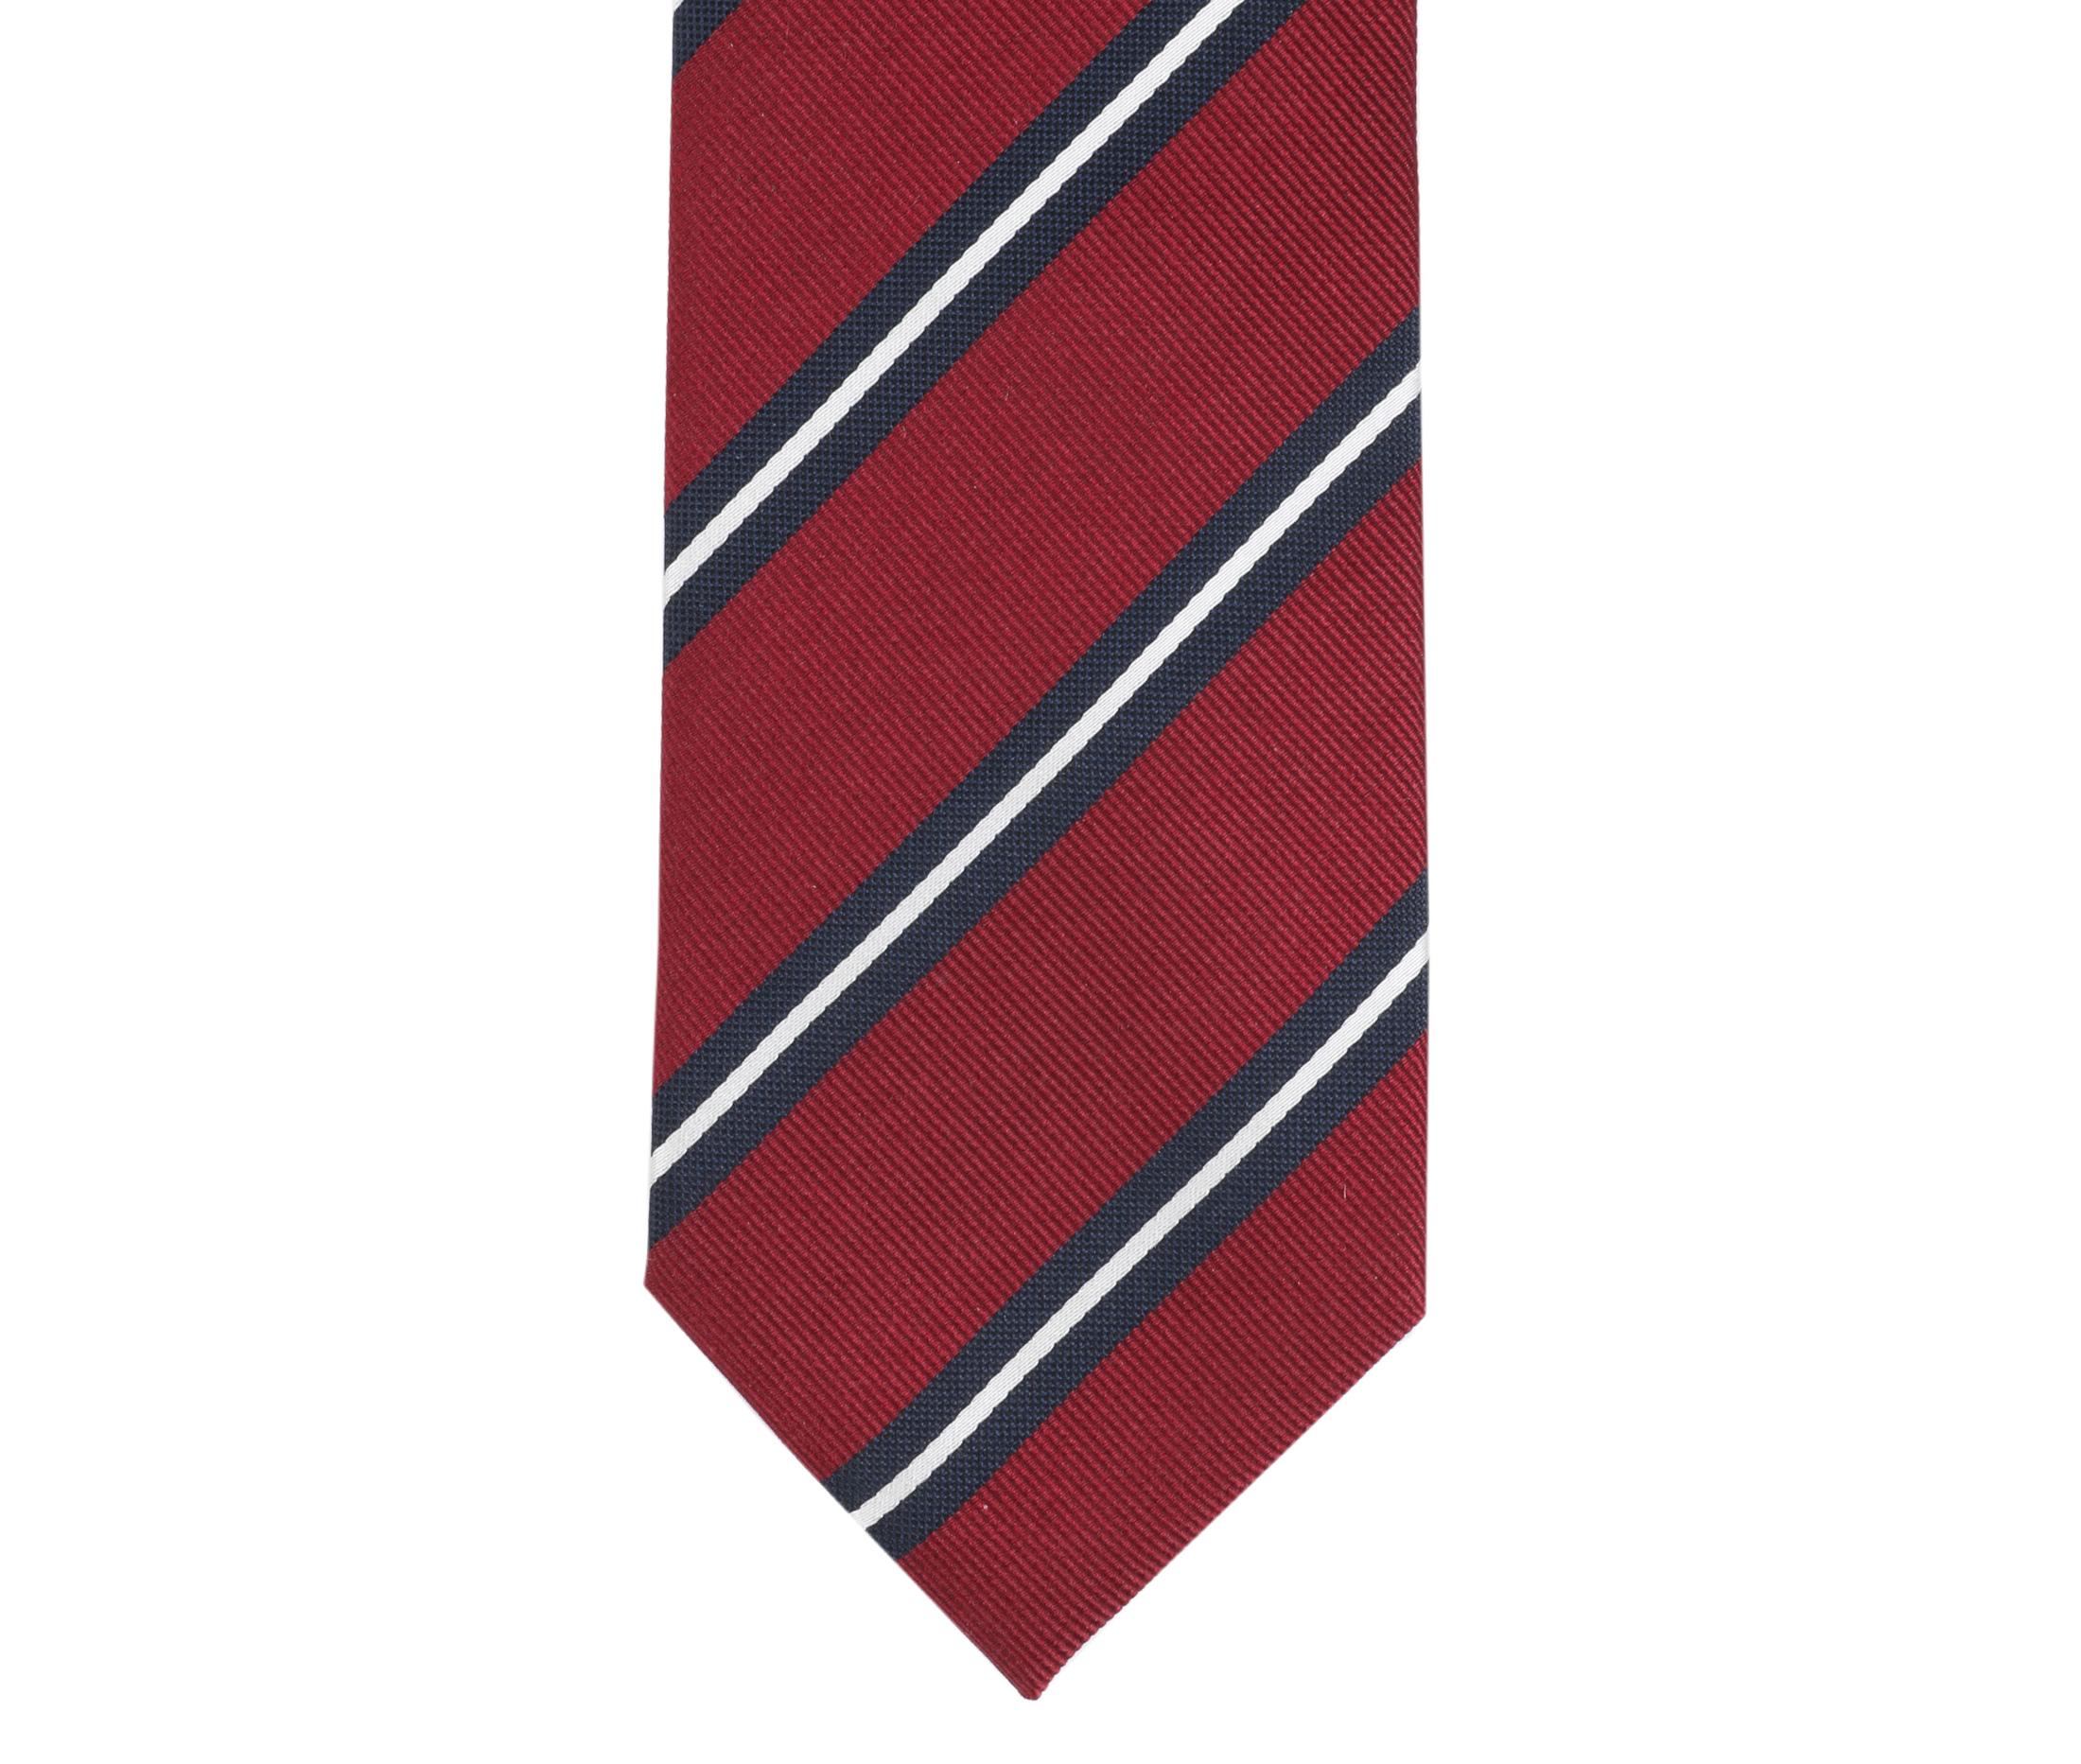 Krawatte Seide Streifen Rot foto 2